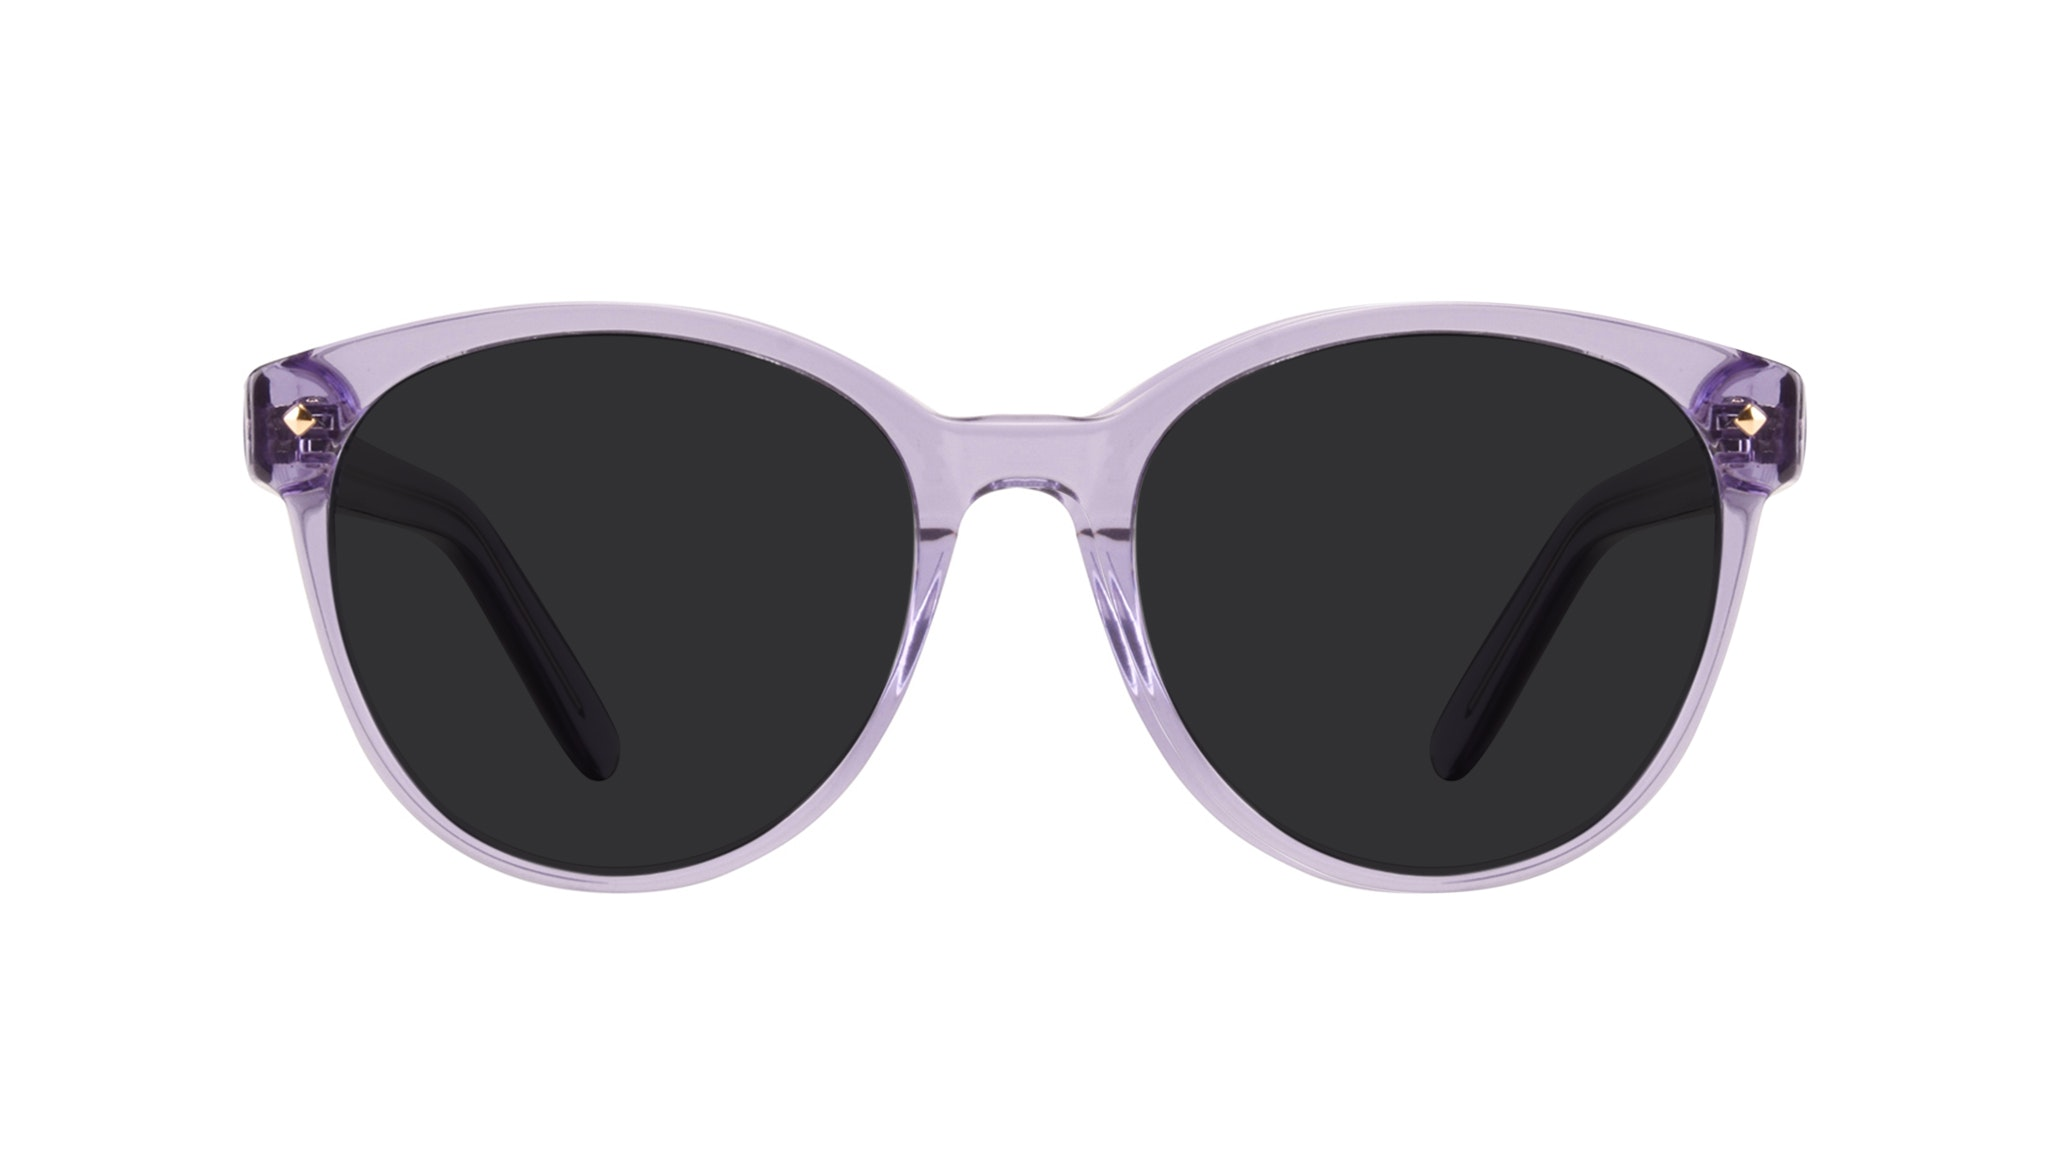 Affordable Fashion Glasses Round Sunglasses Women Eclipse Lavender